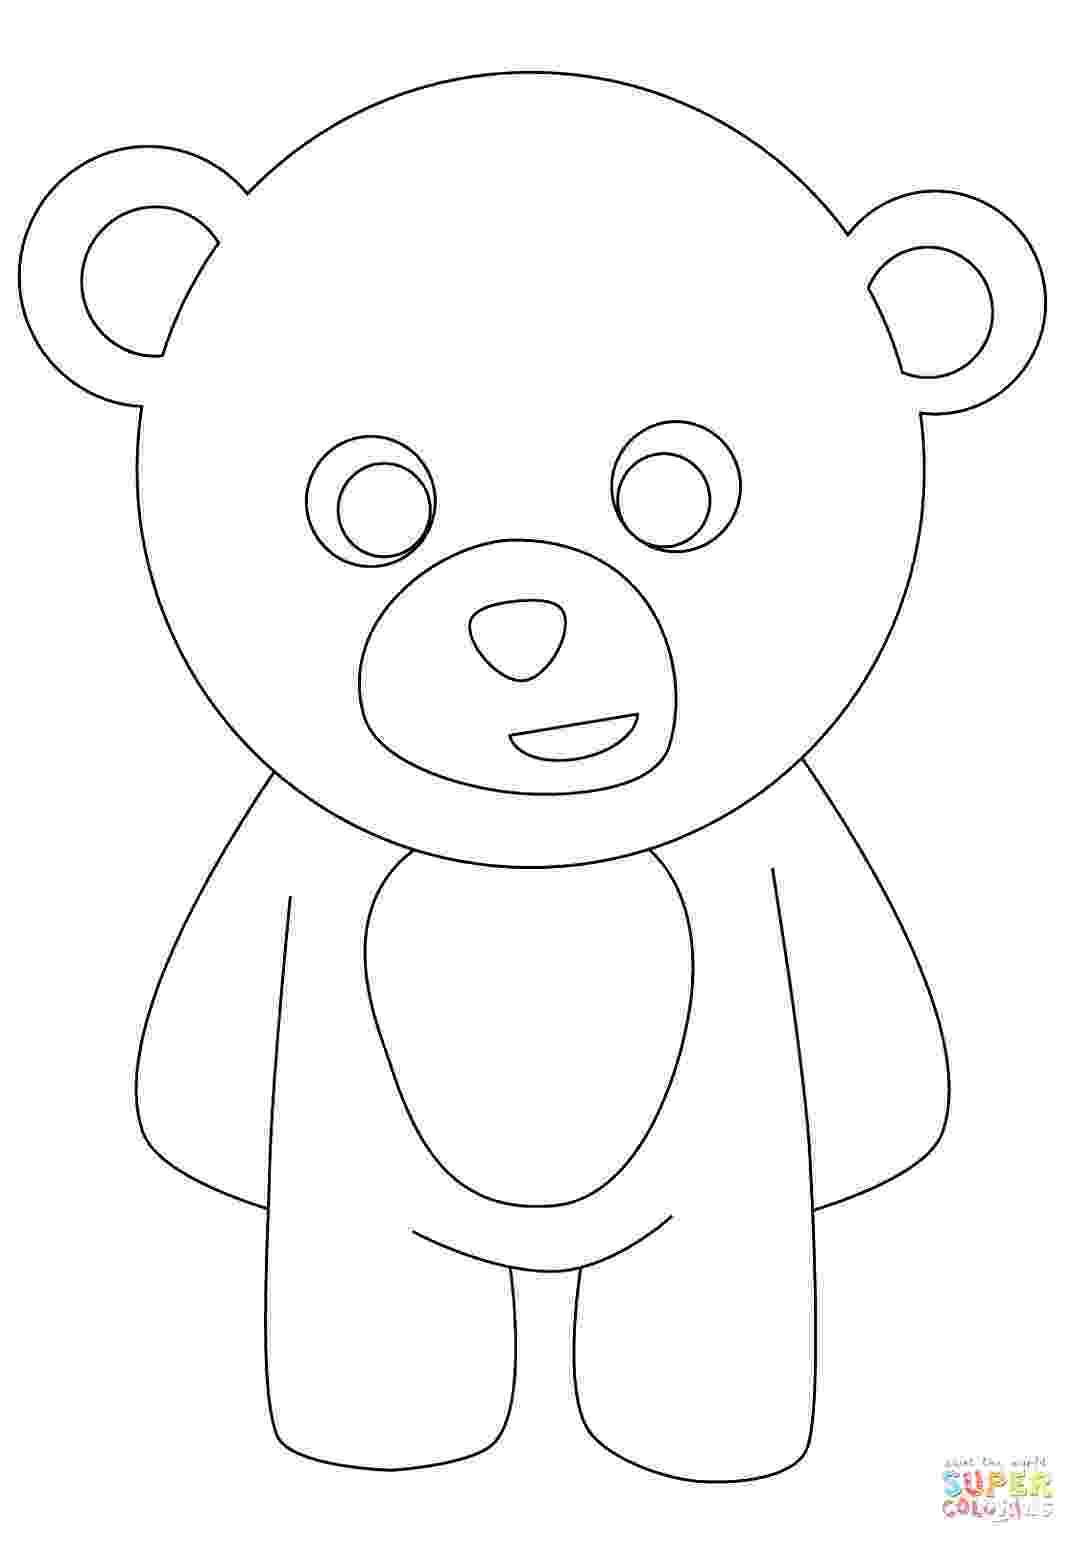 pudsey bear template printables printable bear ears printable pudsey bear template printables template pudsey bear 1 1